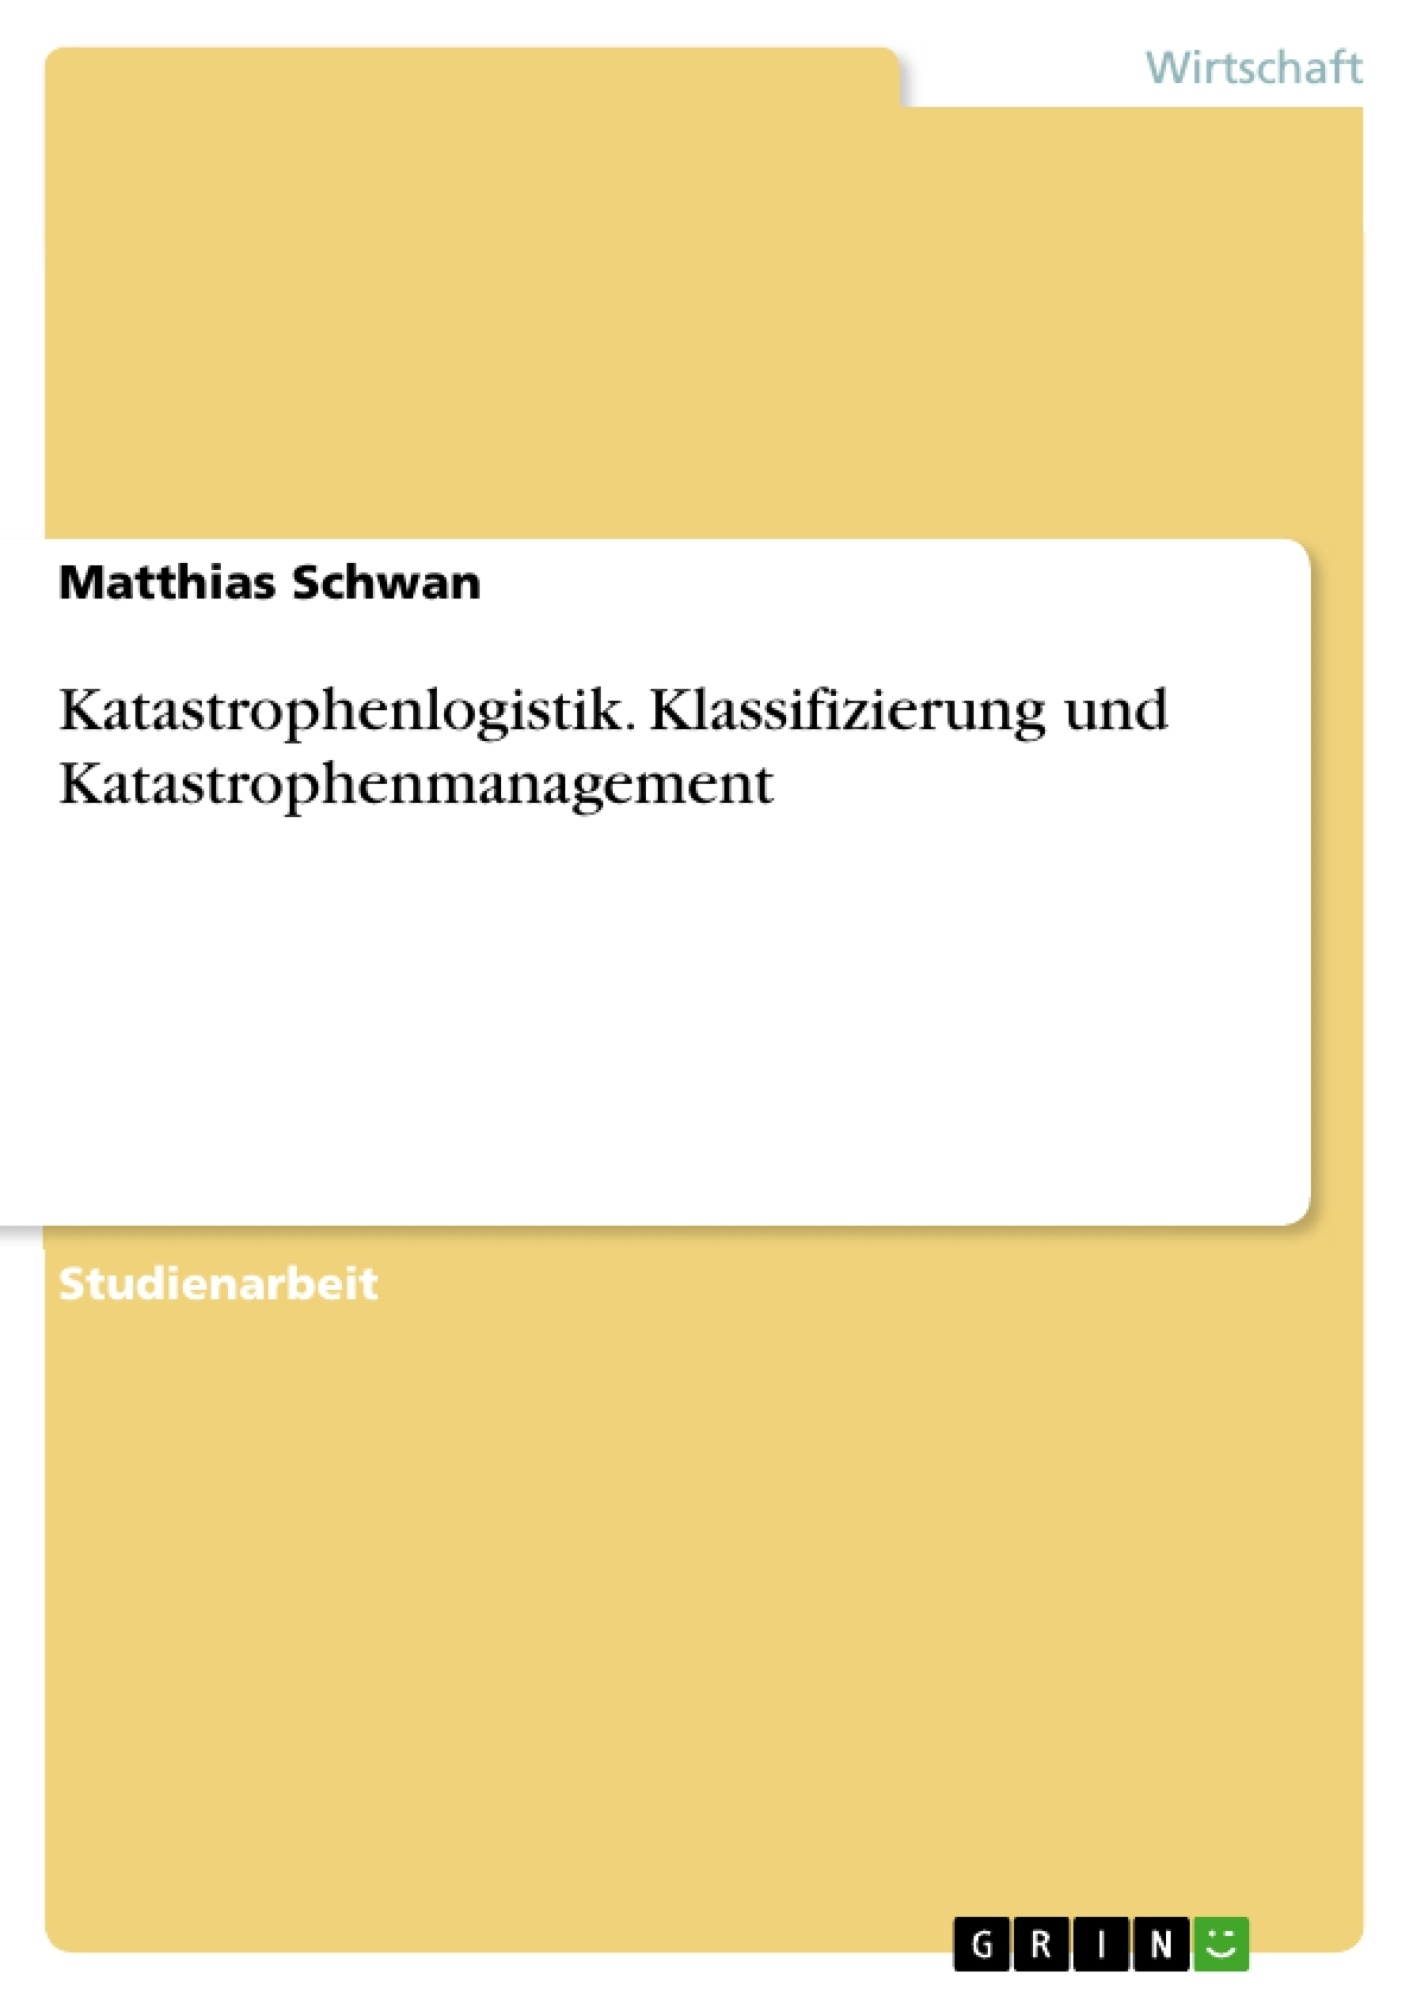 Titel: Katastrophenlogistik. Klassifizierung und Katastrophenmanagement